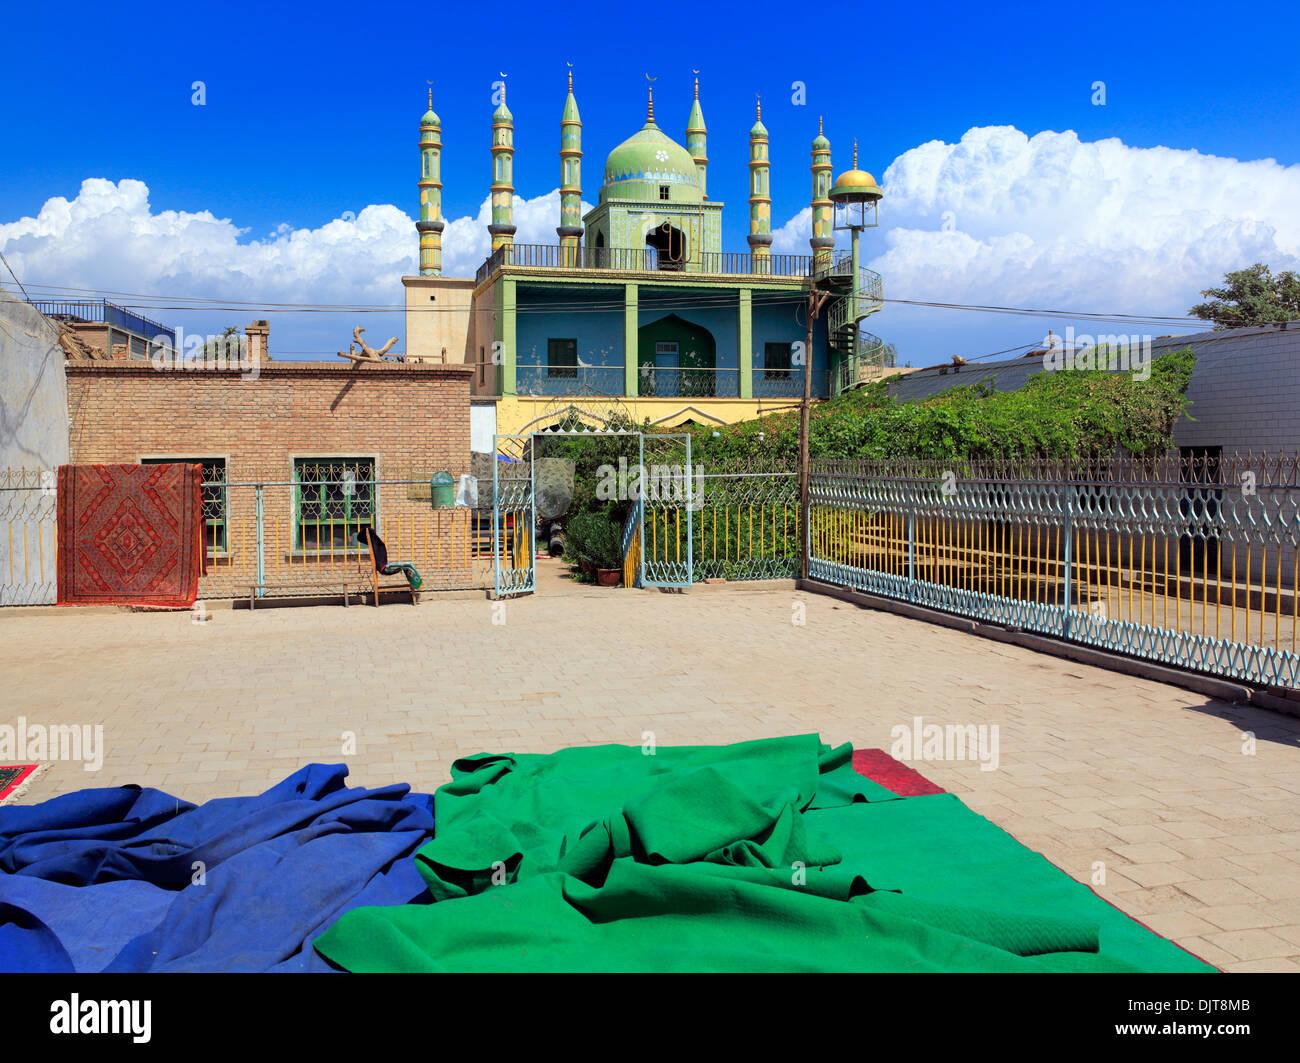 Turpan, Turpan Prefecture, Xinjiang Uyghur Autonomous Region, China - Stock Image